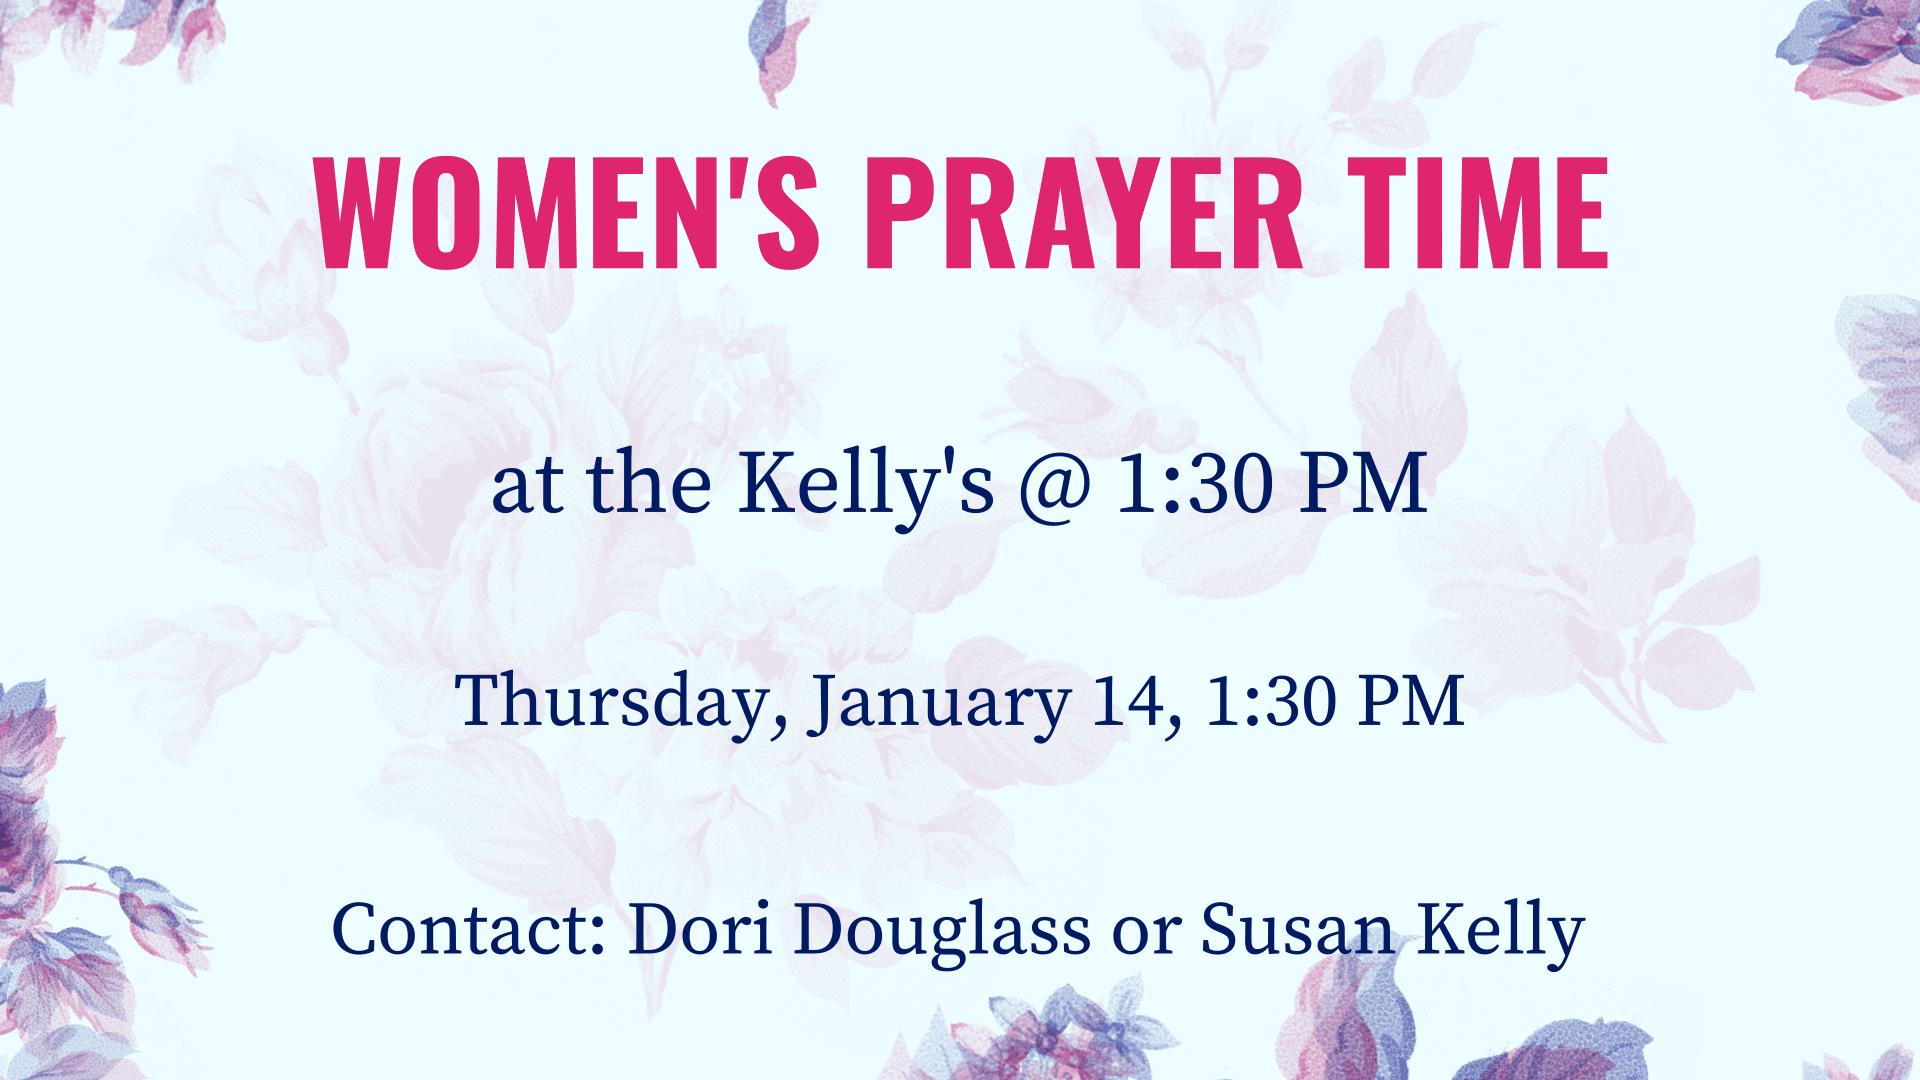 Women's Prayer Time